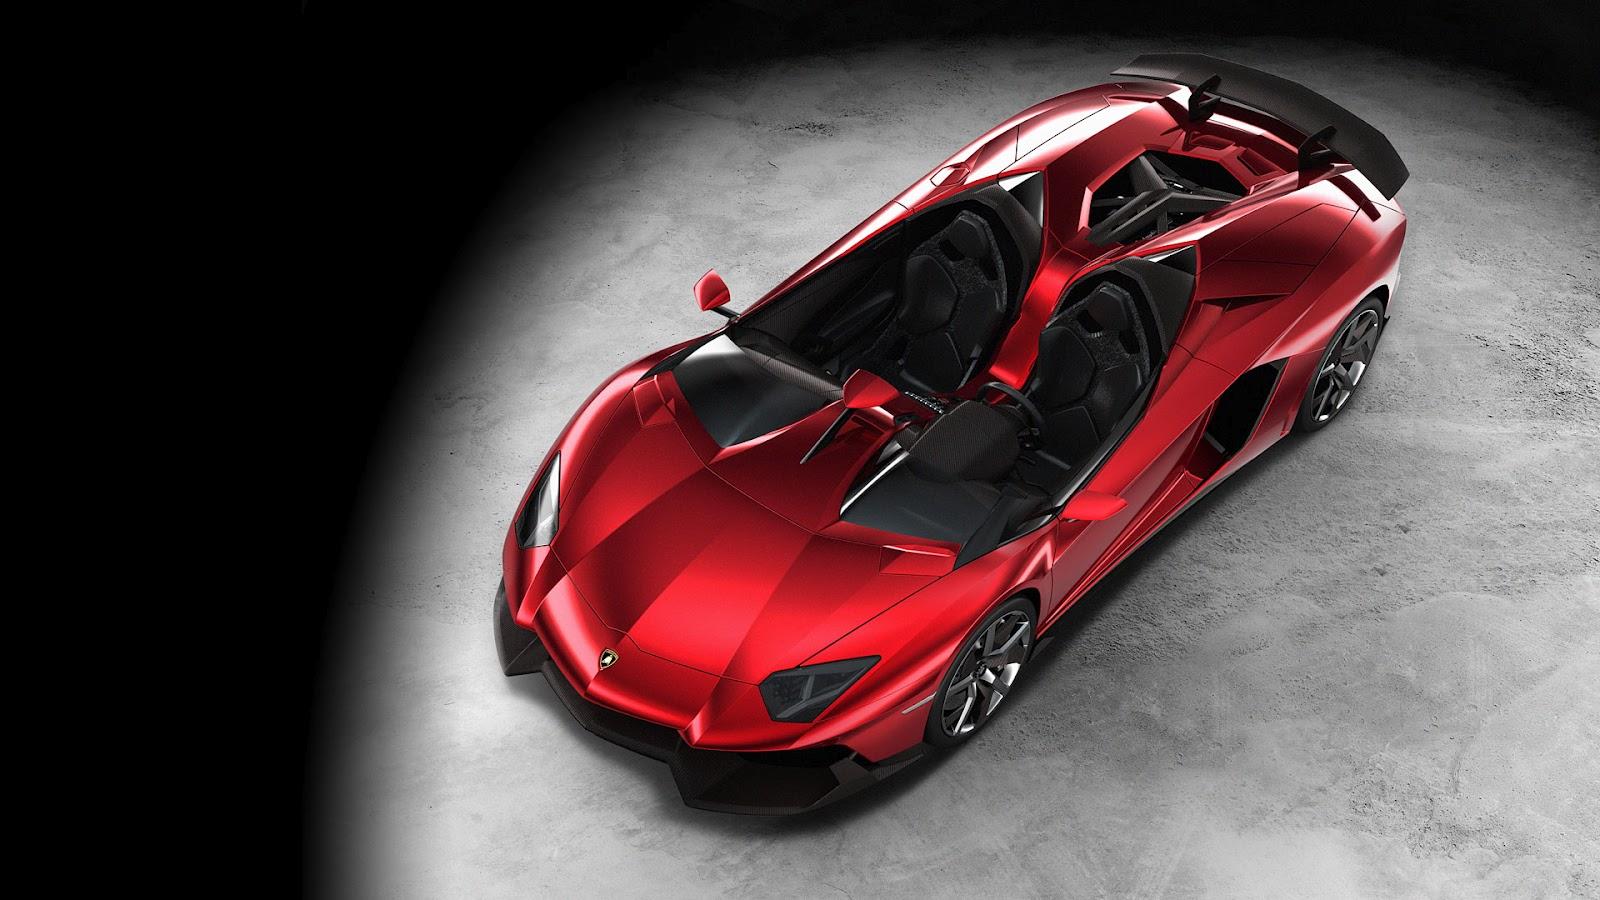 DEZKTOP: 2012 Lamborghini Aventador J - Exclusive HD ...